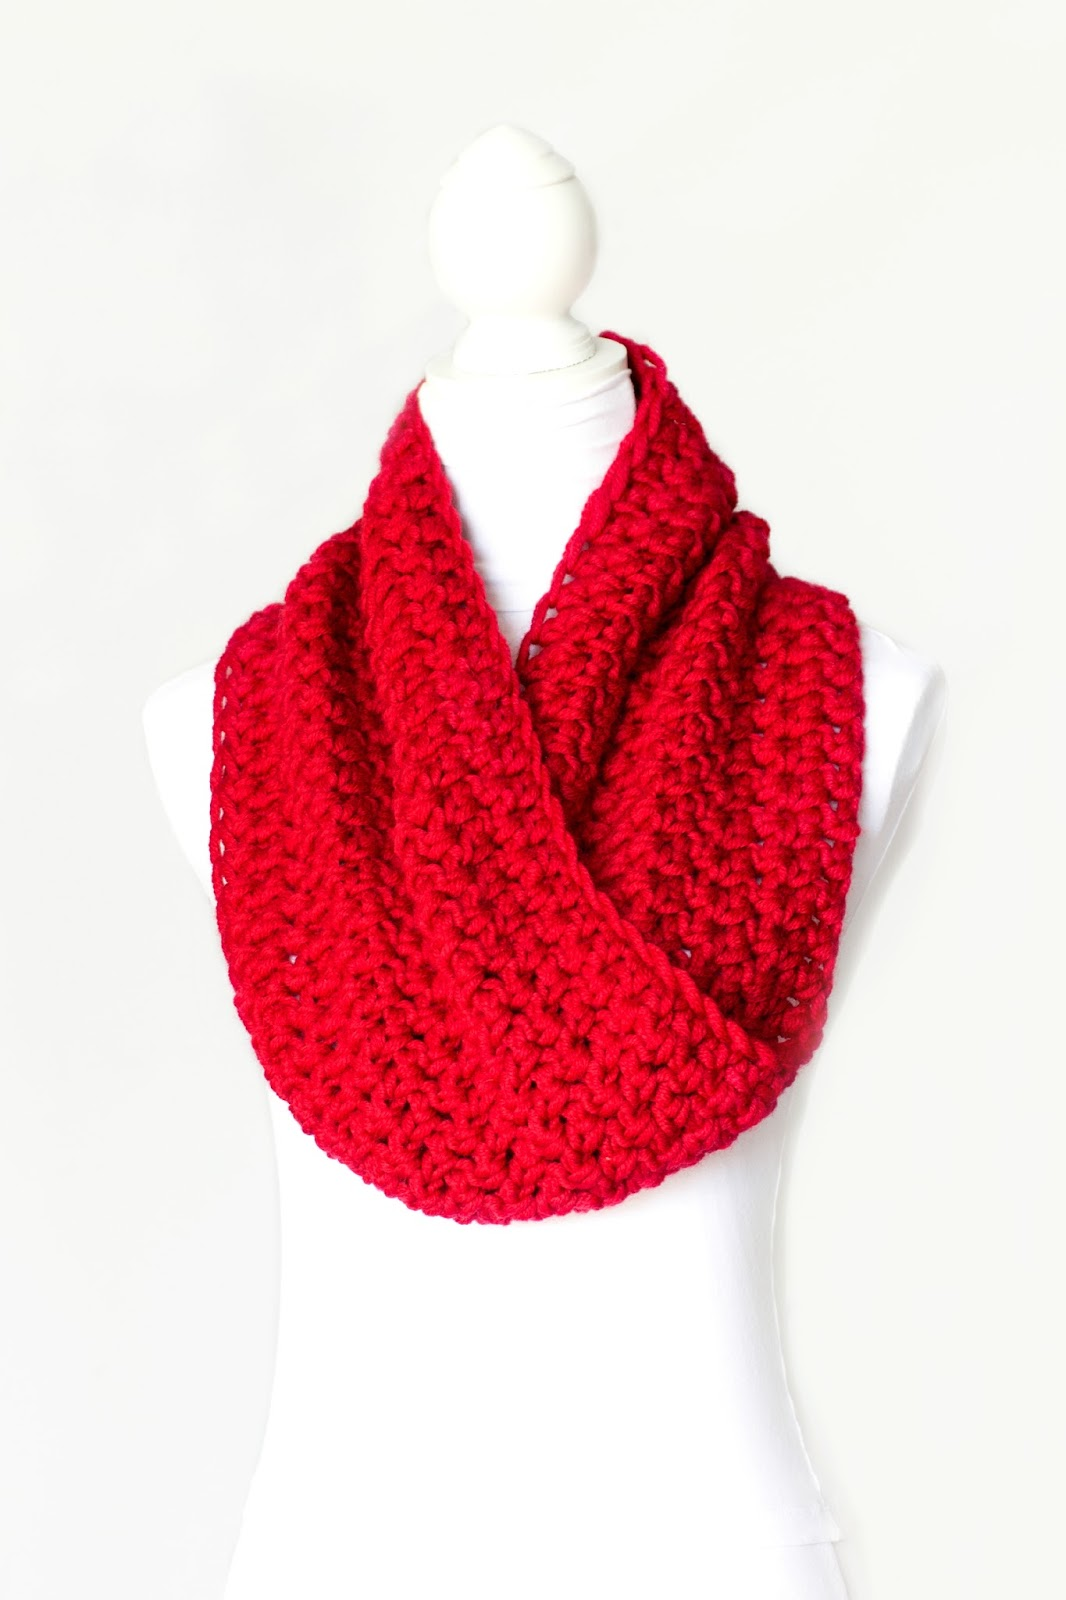 Crochet Patterns Cowl : Hopeful Honey Craft, Crochet, Create: Classic Cowl Crochet Pattern